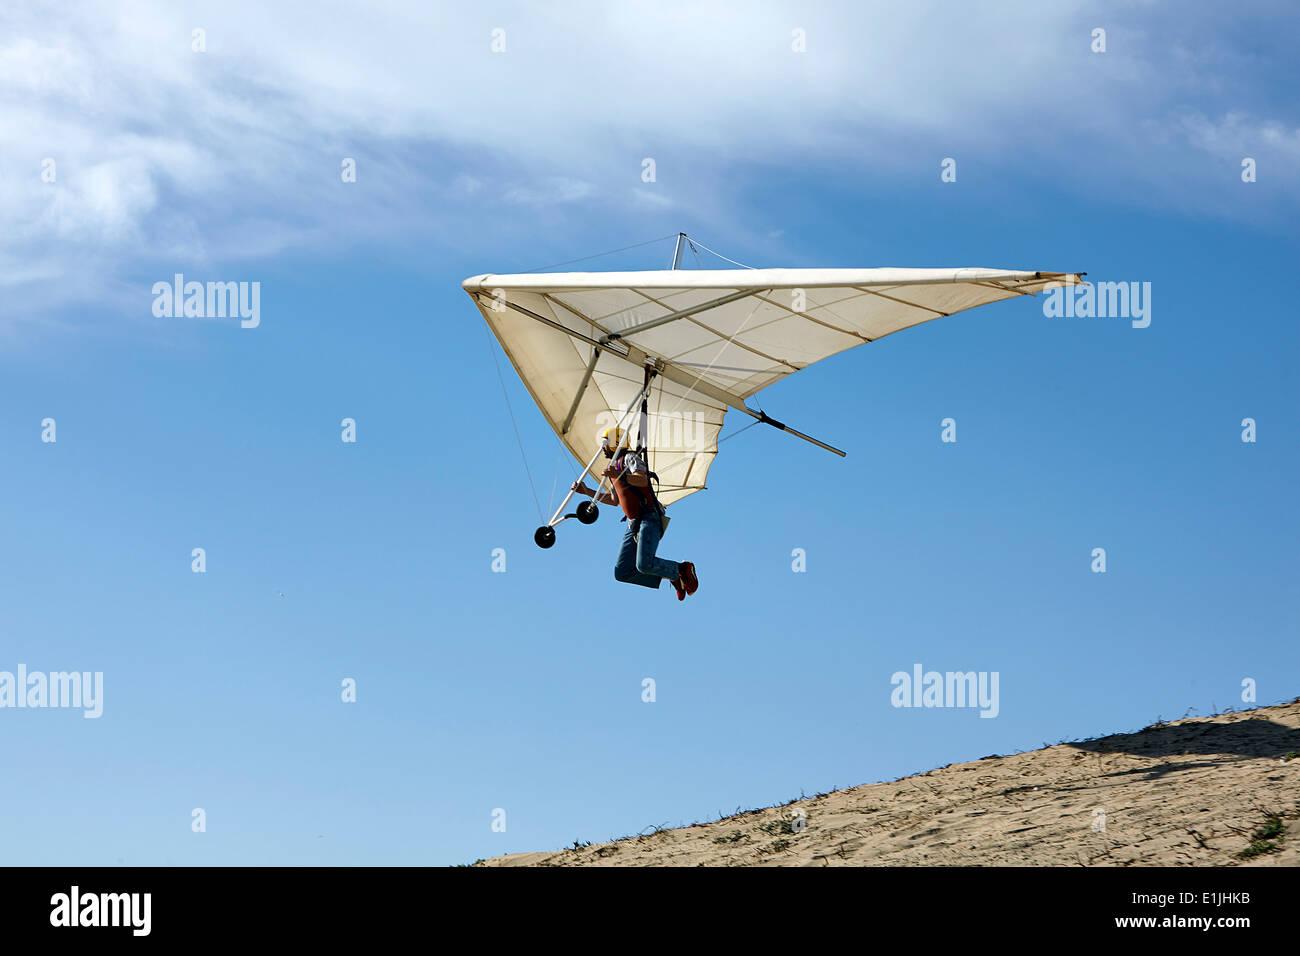 Hombre volando ala delta Imagen De Stock